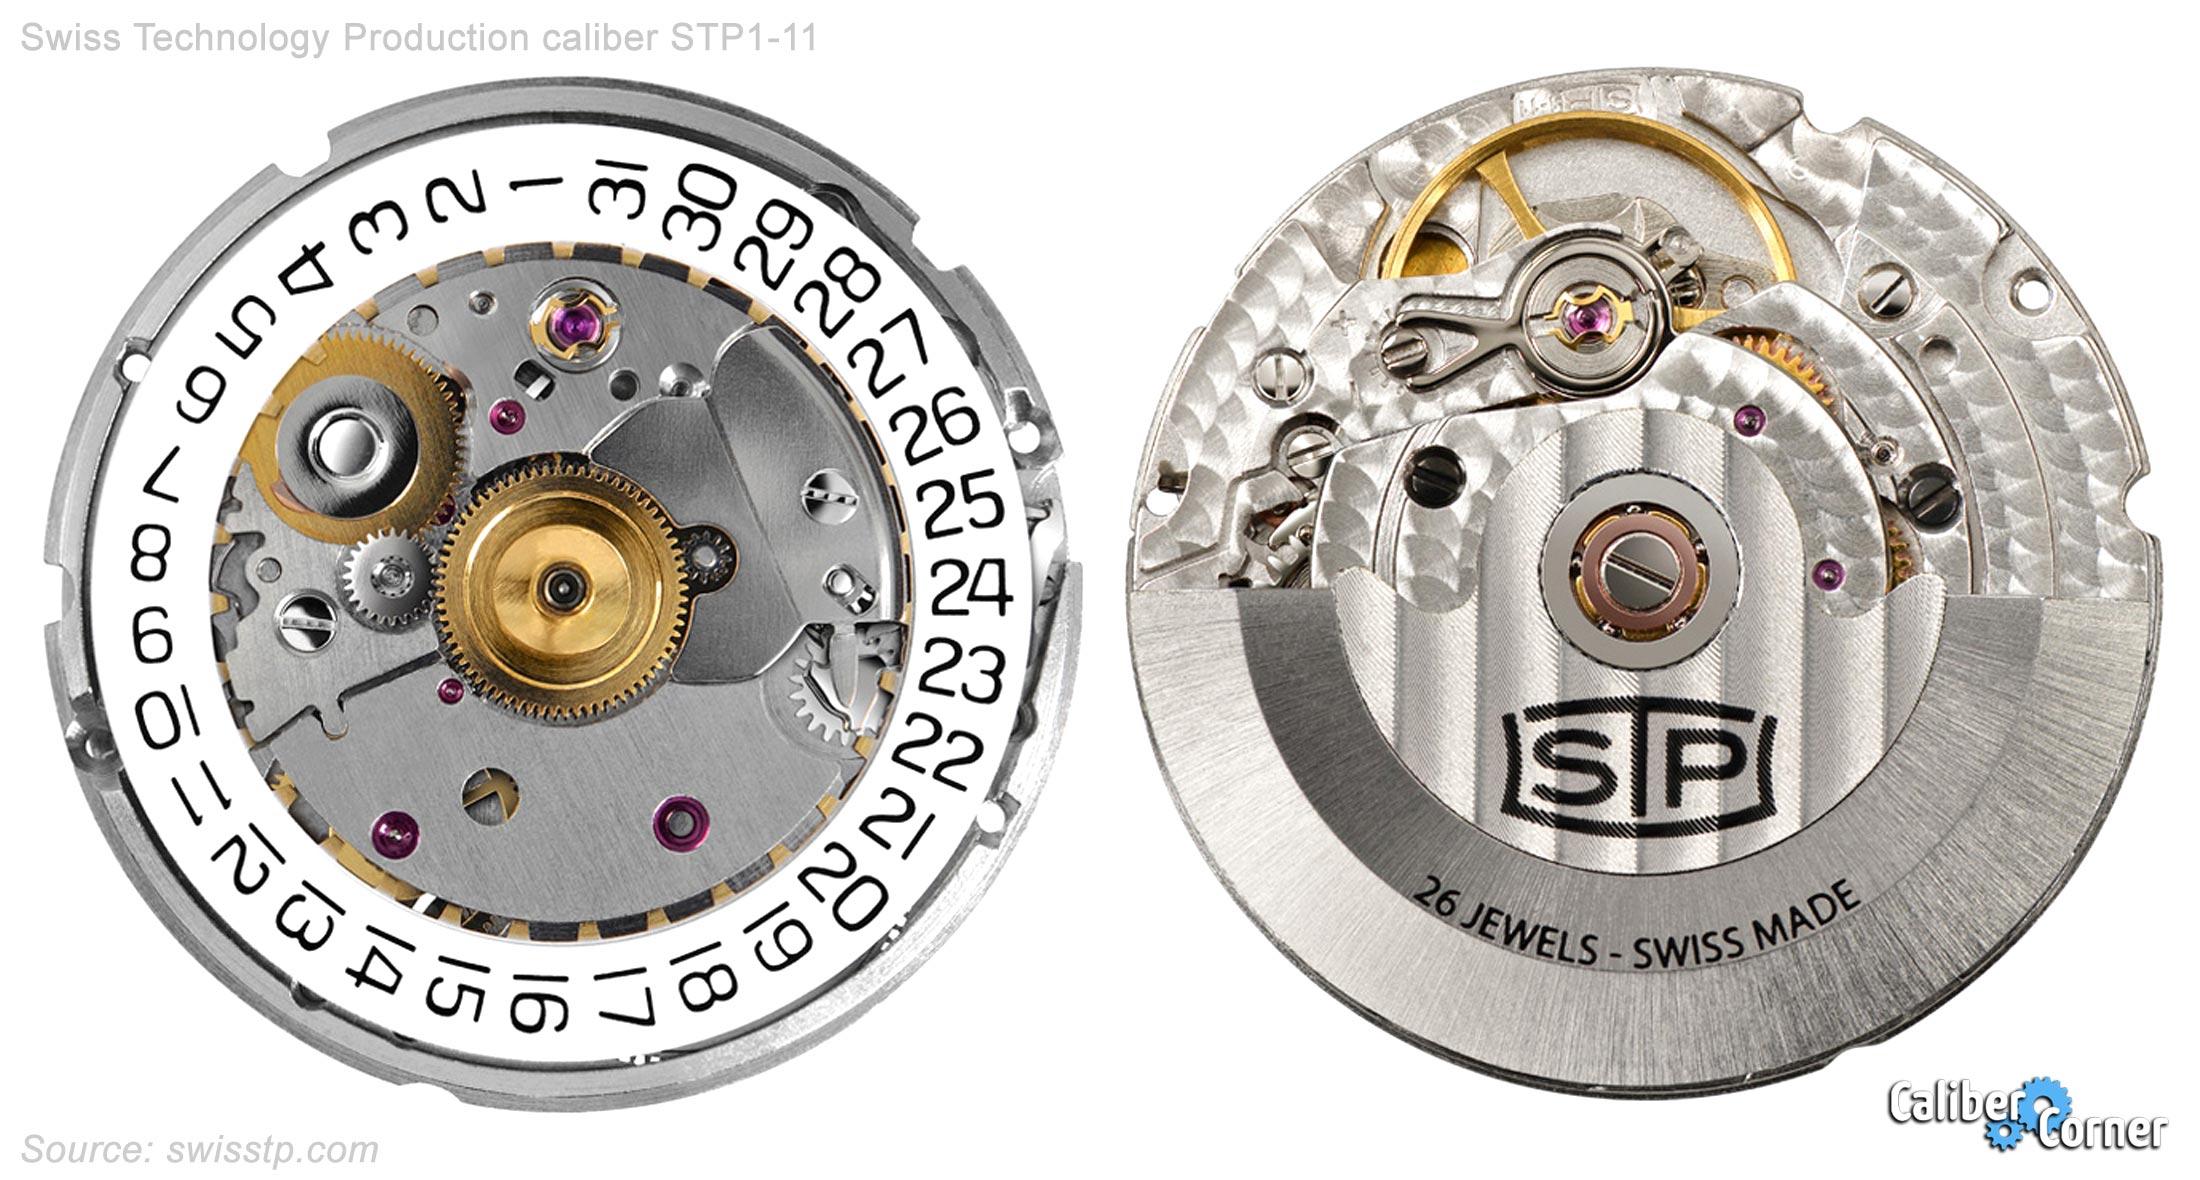 Swiss Technology Production Caliber Stp1 11